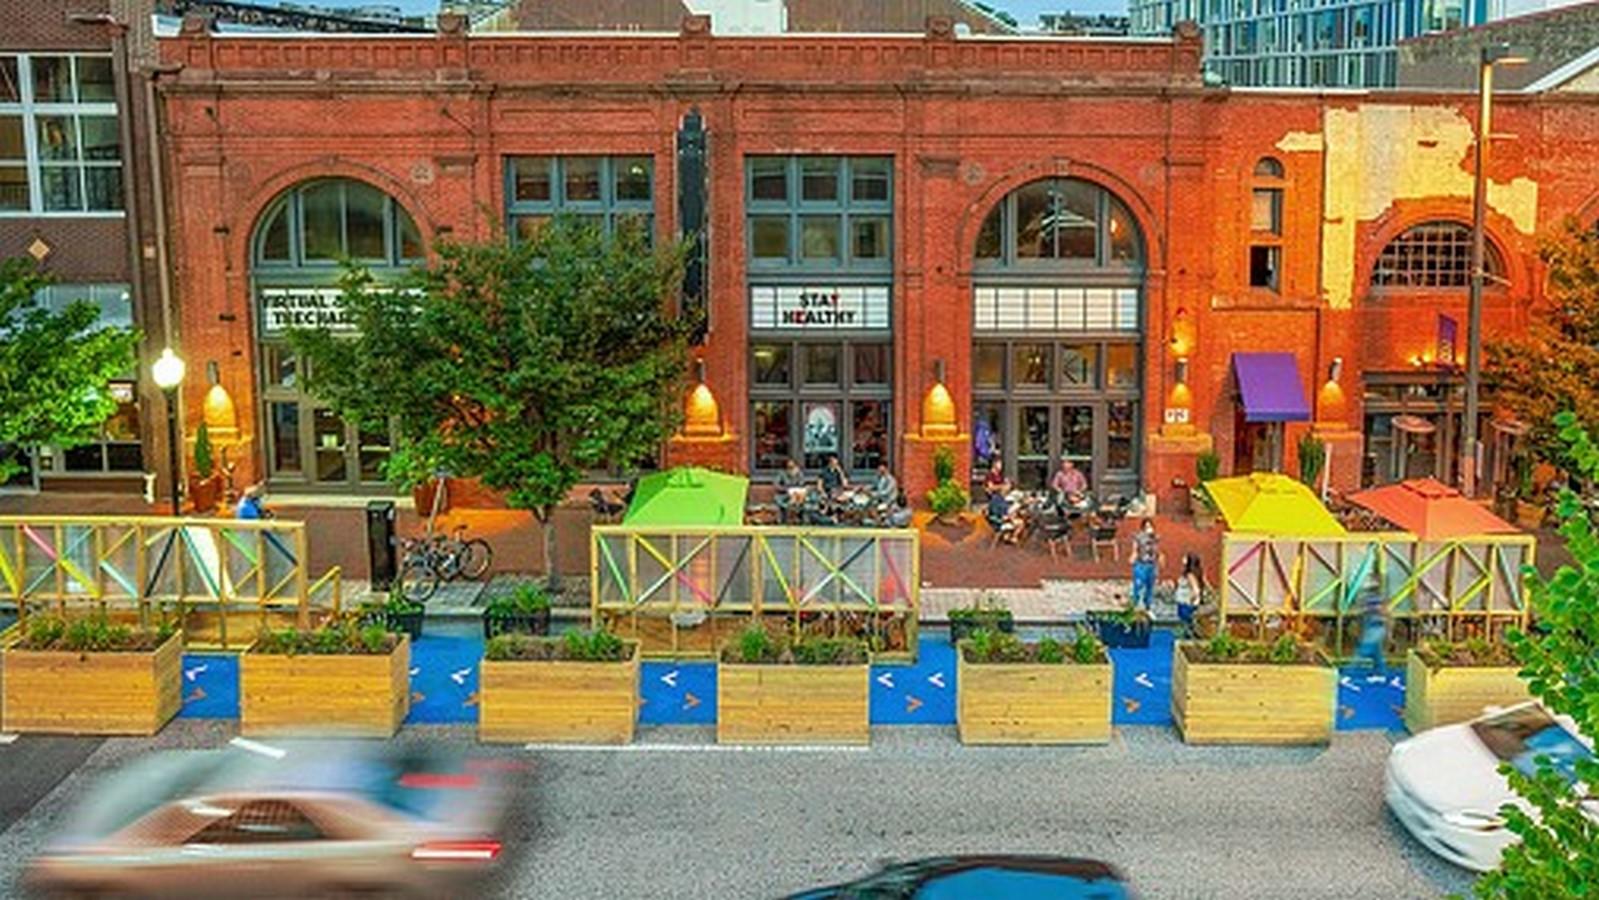 Gensler- 10 Cities & Urban Design Projects Sheet16